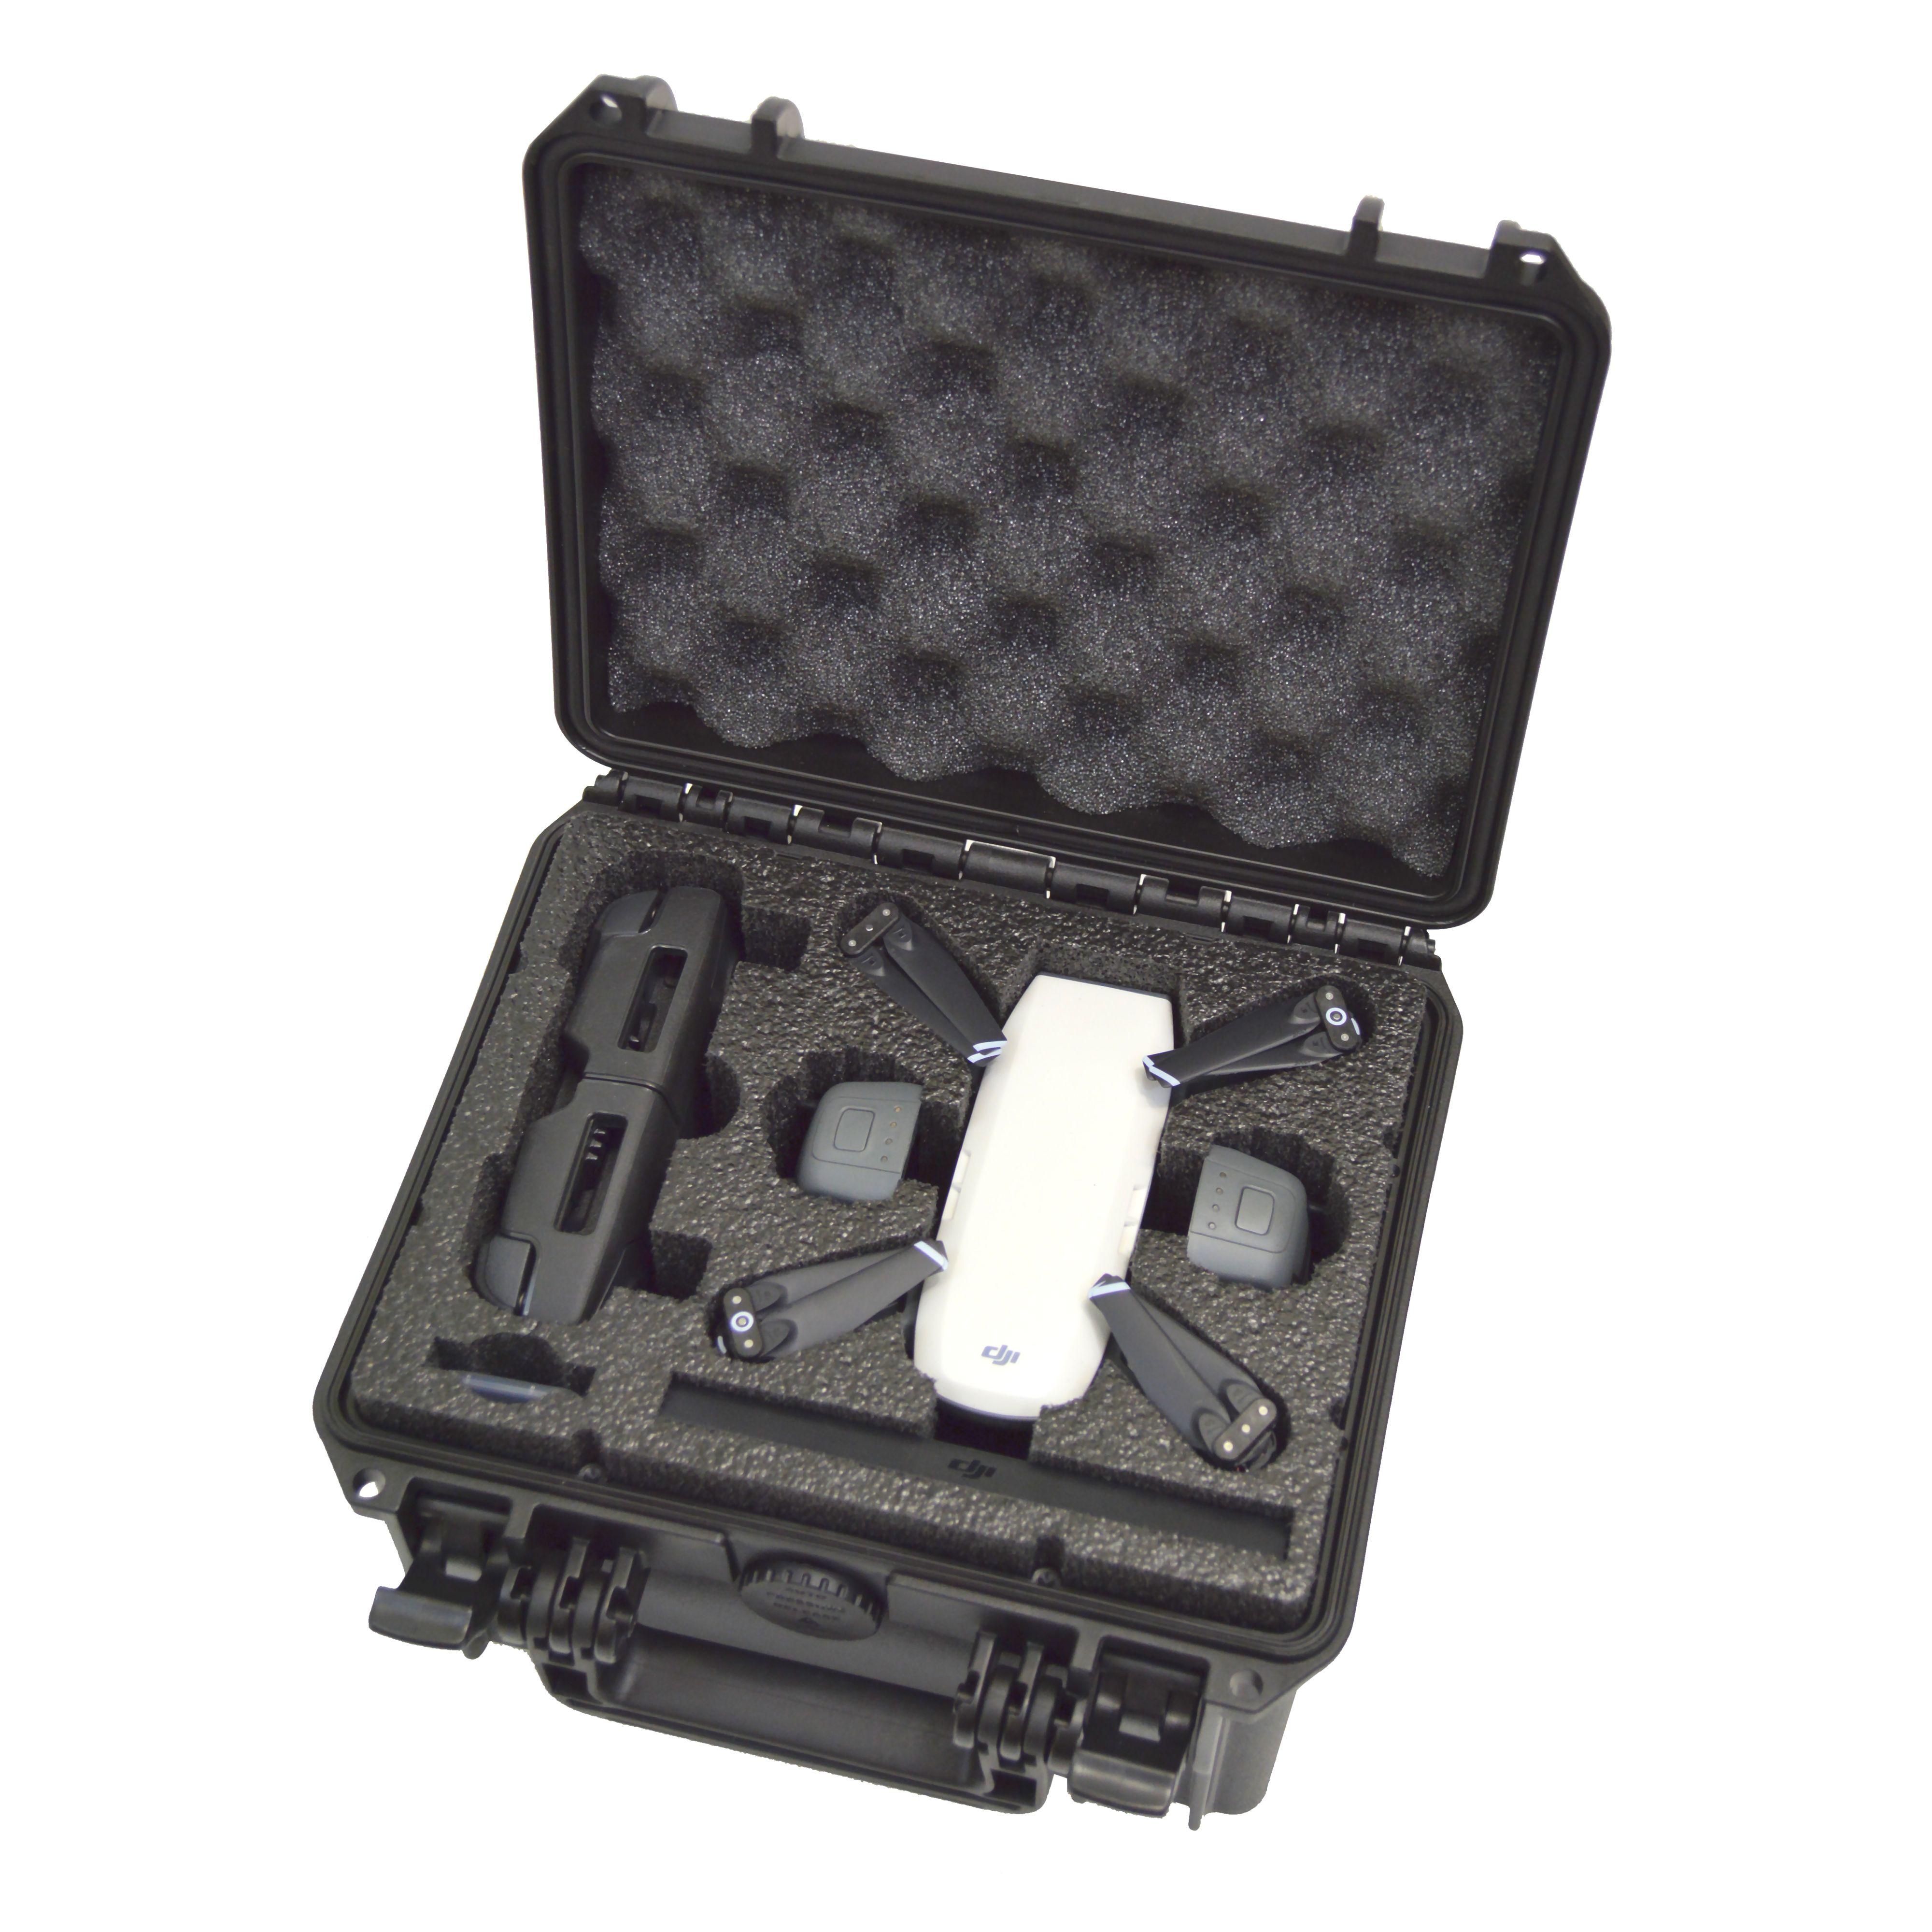 DJI Spark dual-level custom foam DORO D0907-6 case - TOP LEVEL